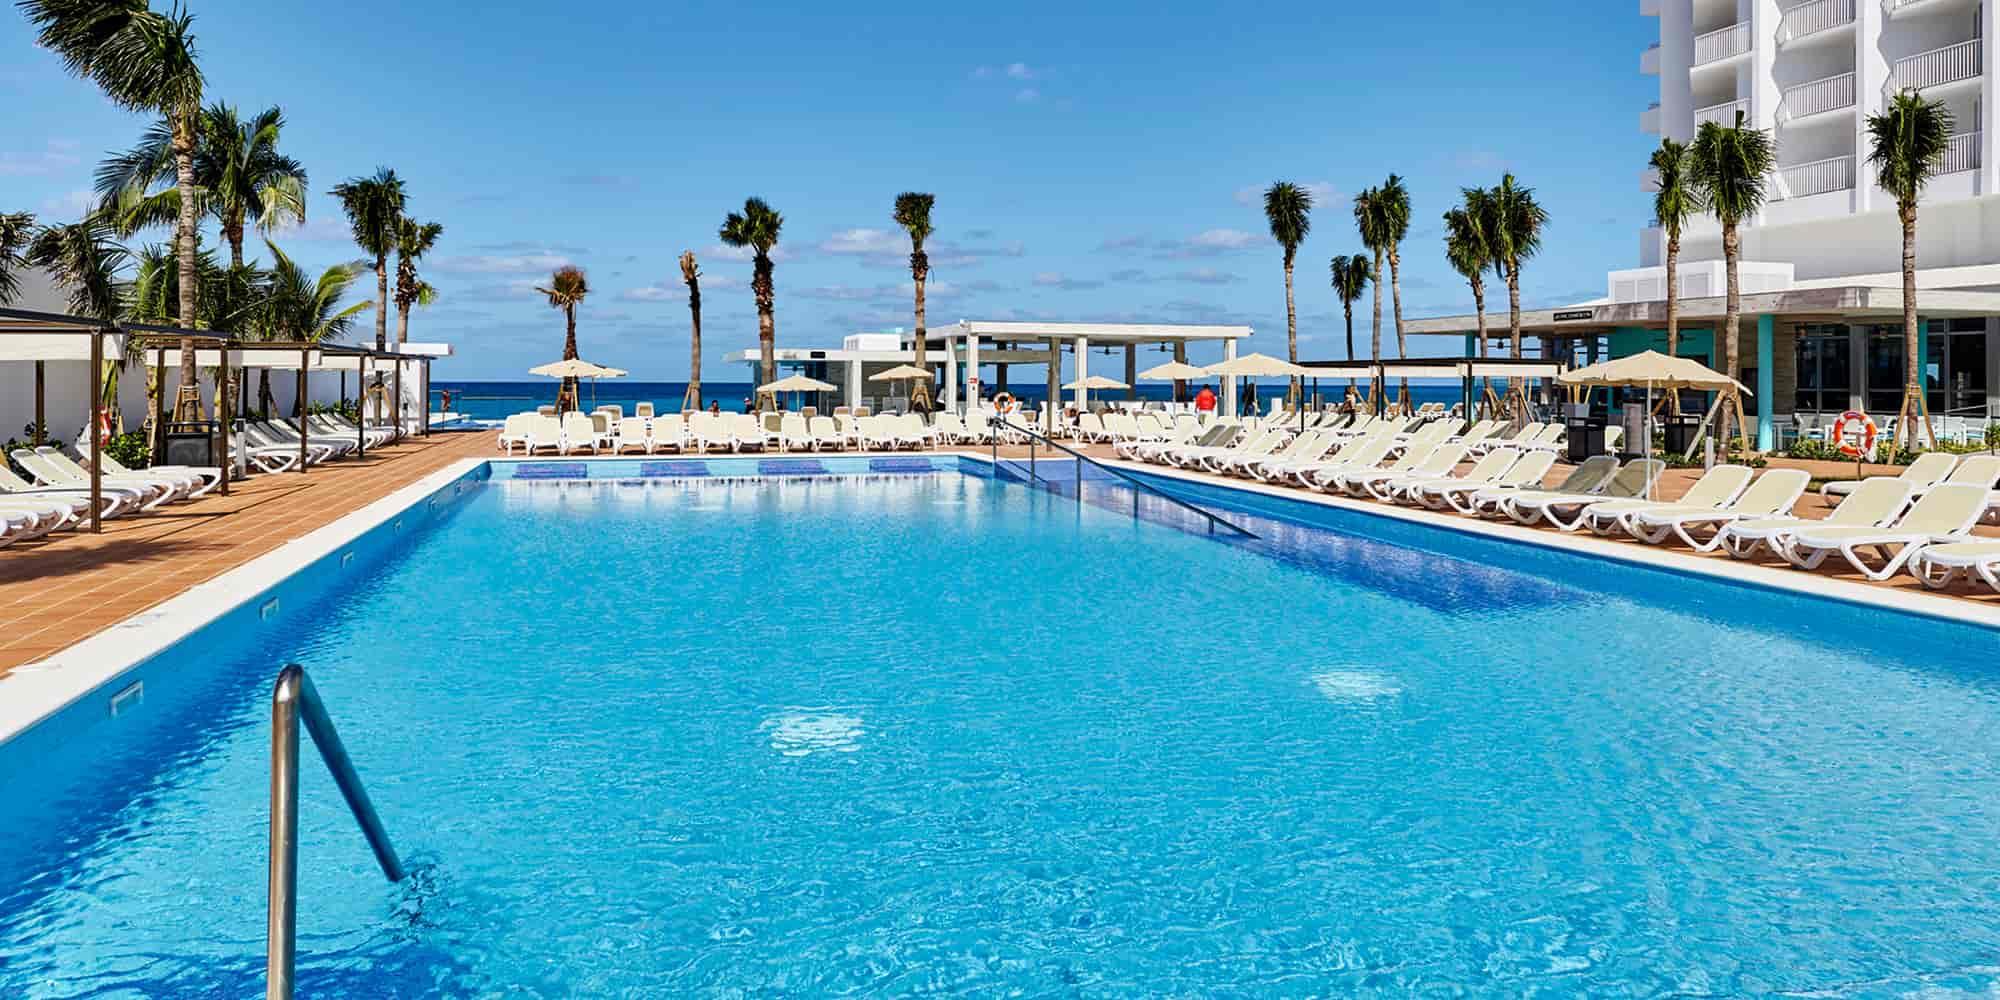 Hotel Riu Palace Paradise Island | Adults Only Hotel Paradise Island